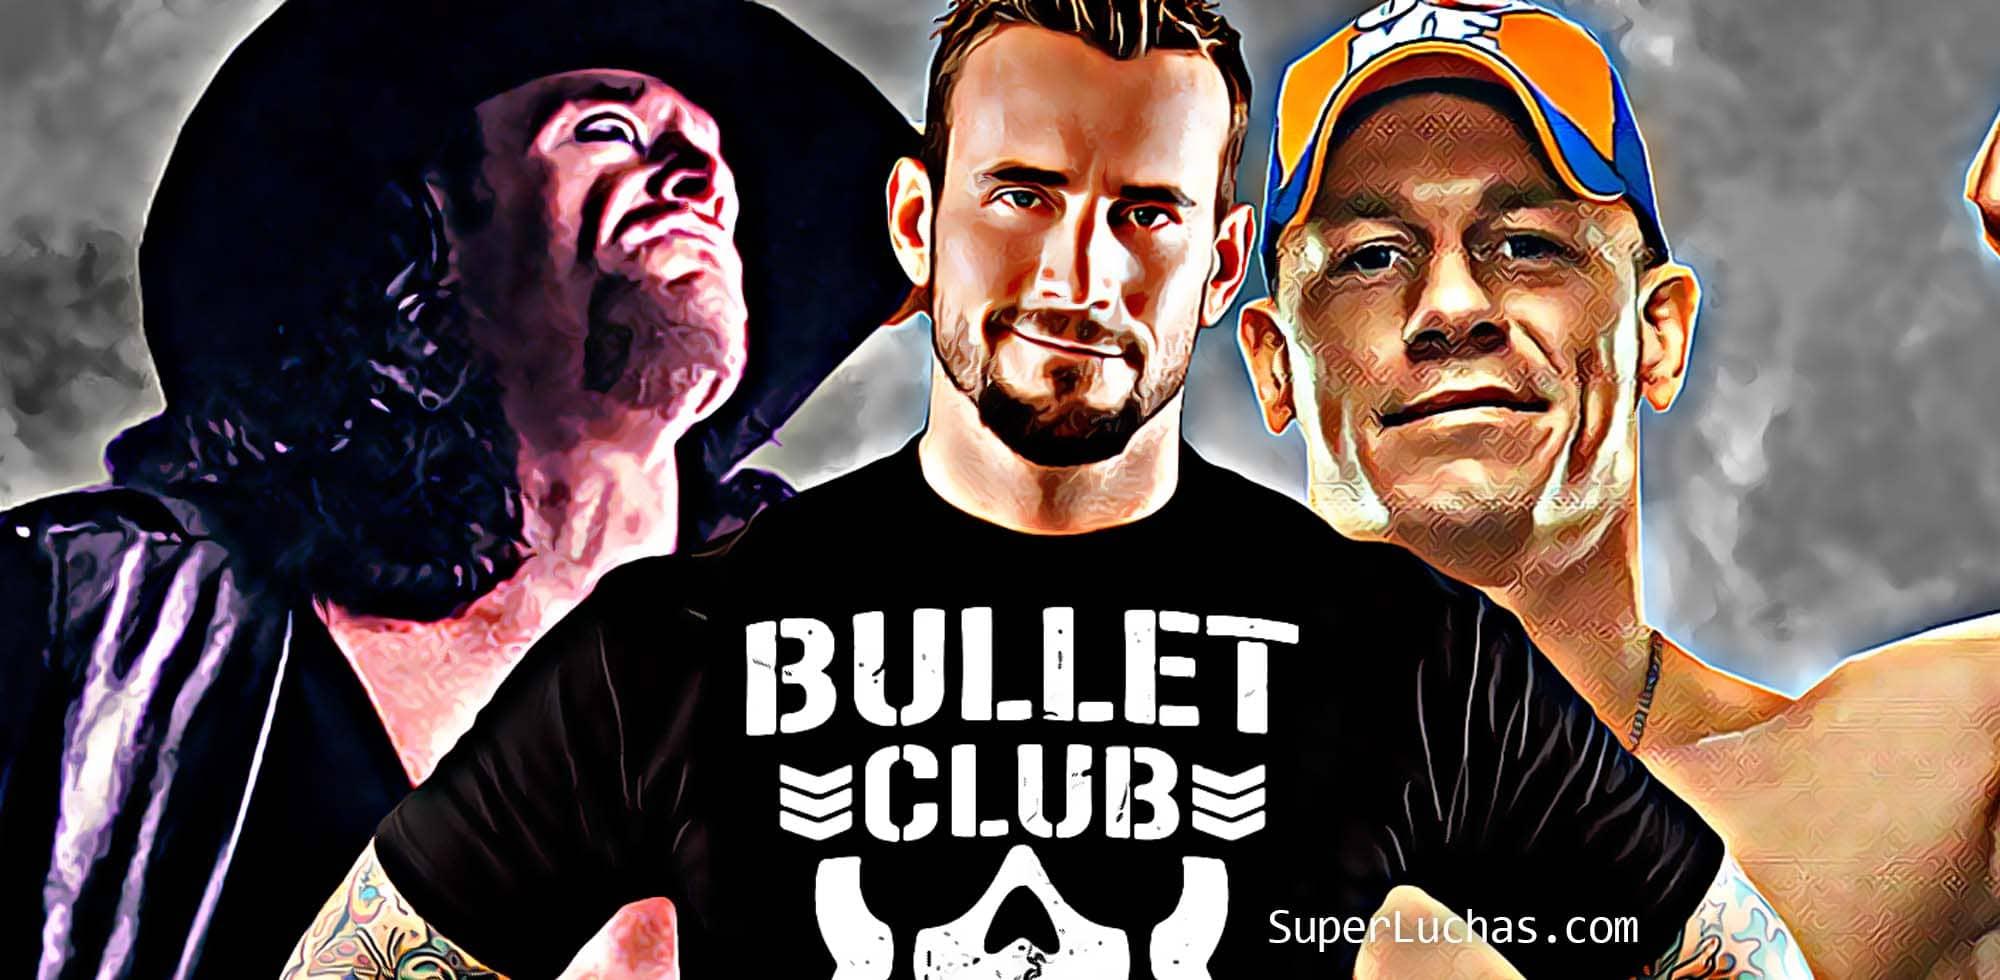 Pregúntale a SÚPER LUCHAS: Undertaker vs. John Cena, ¿buena idea? — CM Punk en el Bullet Club — El origen de Súper Luchas. 1